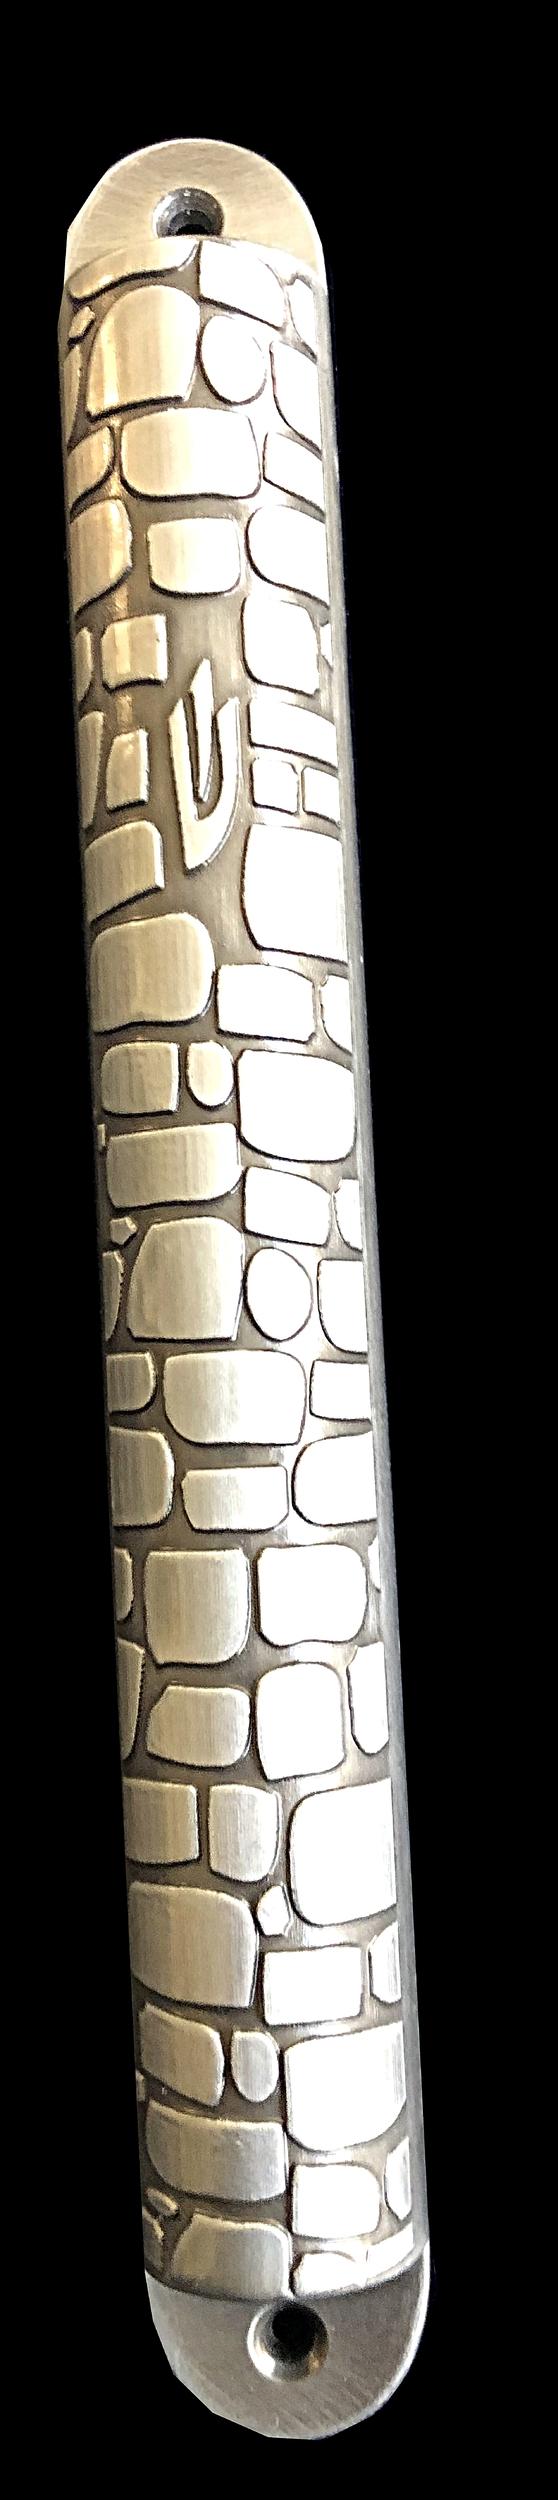 Mezouza style pierre de Jerusalem 29